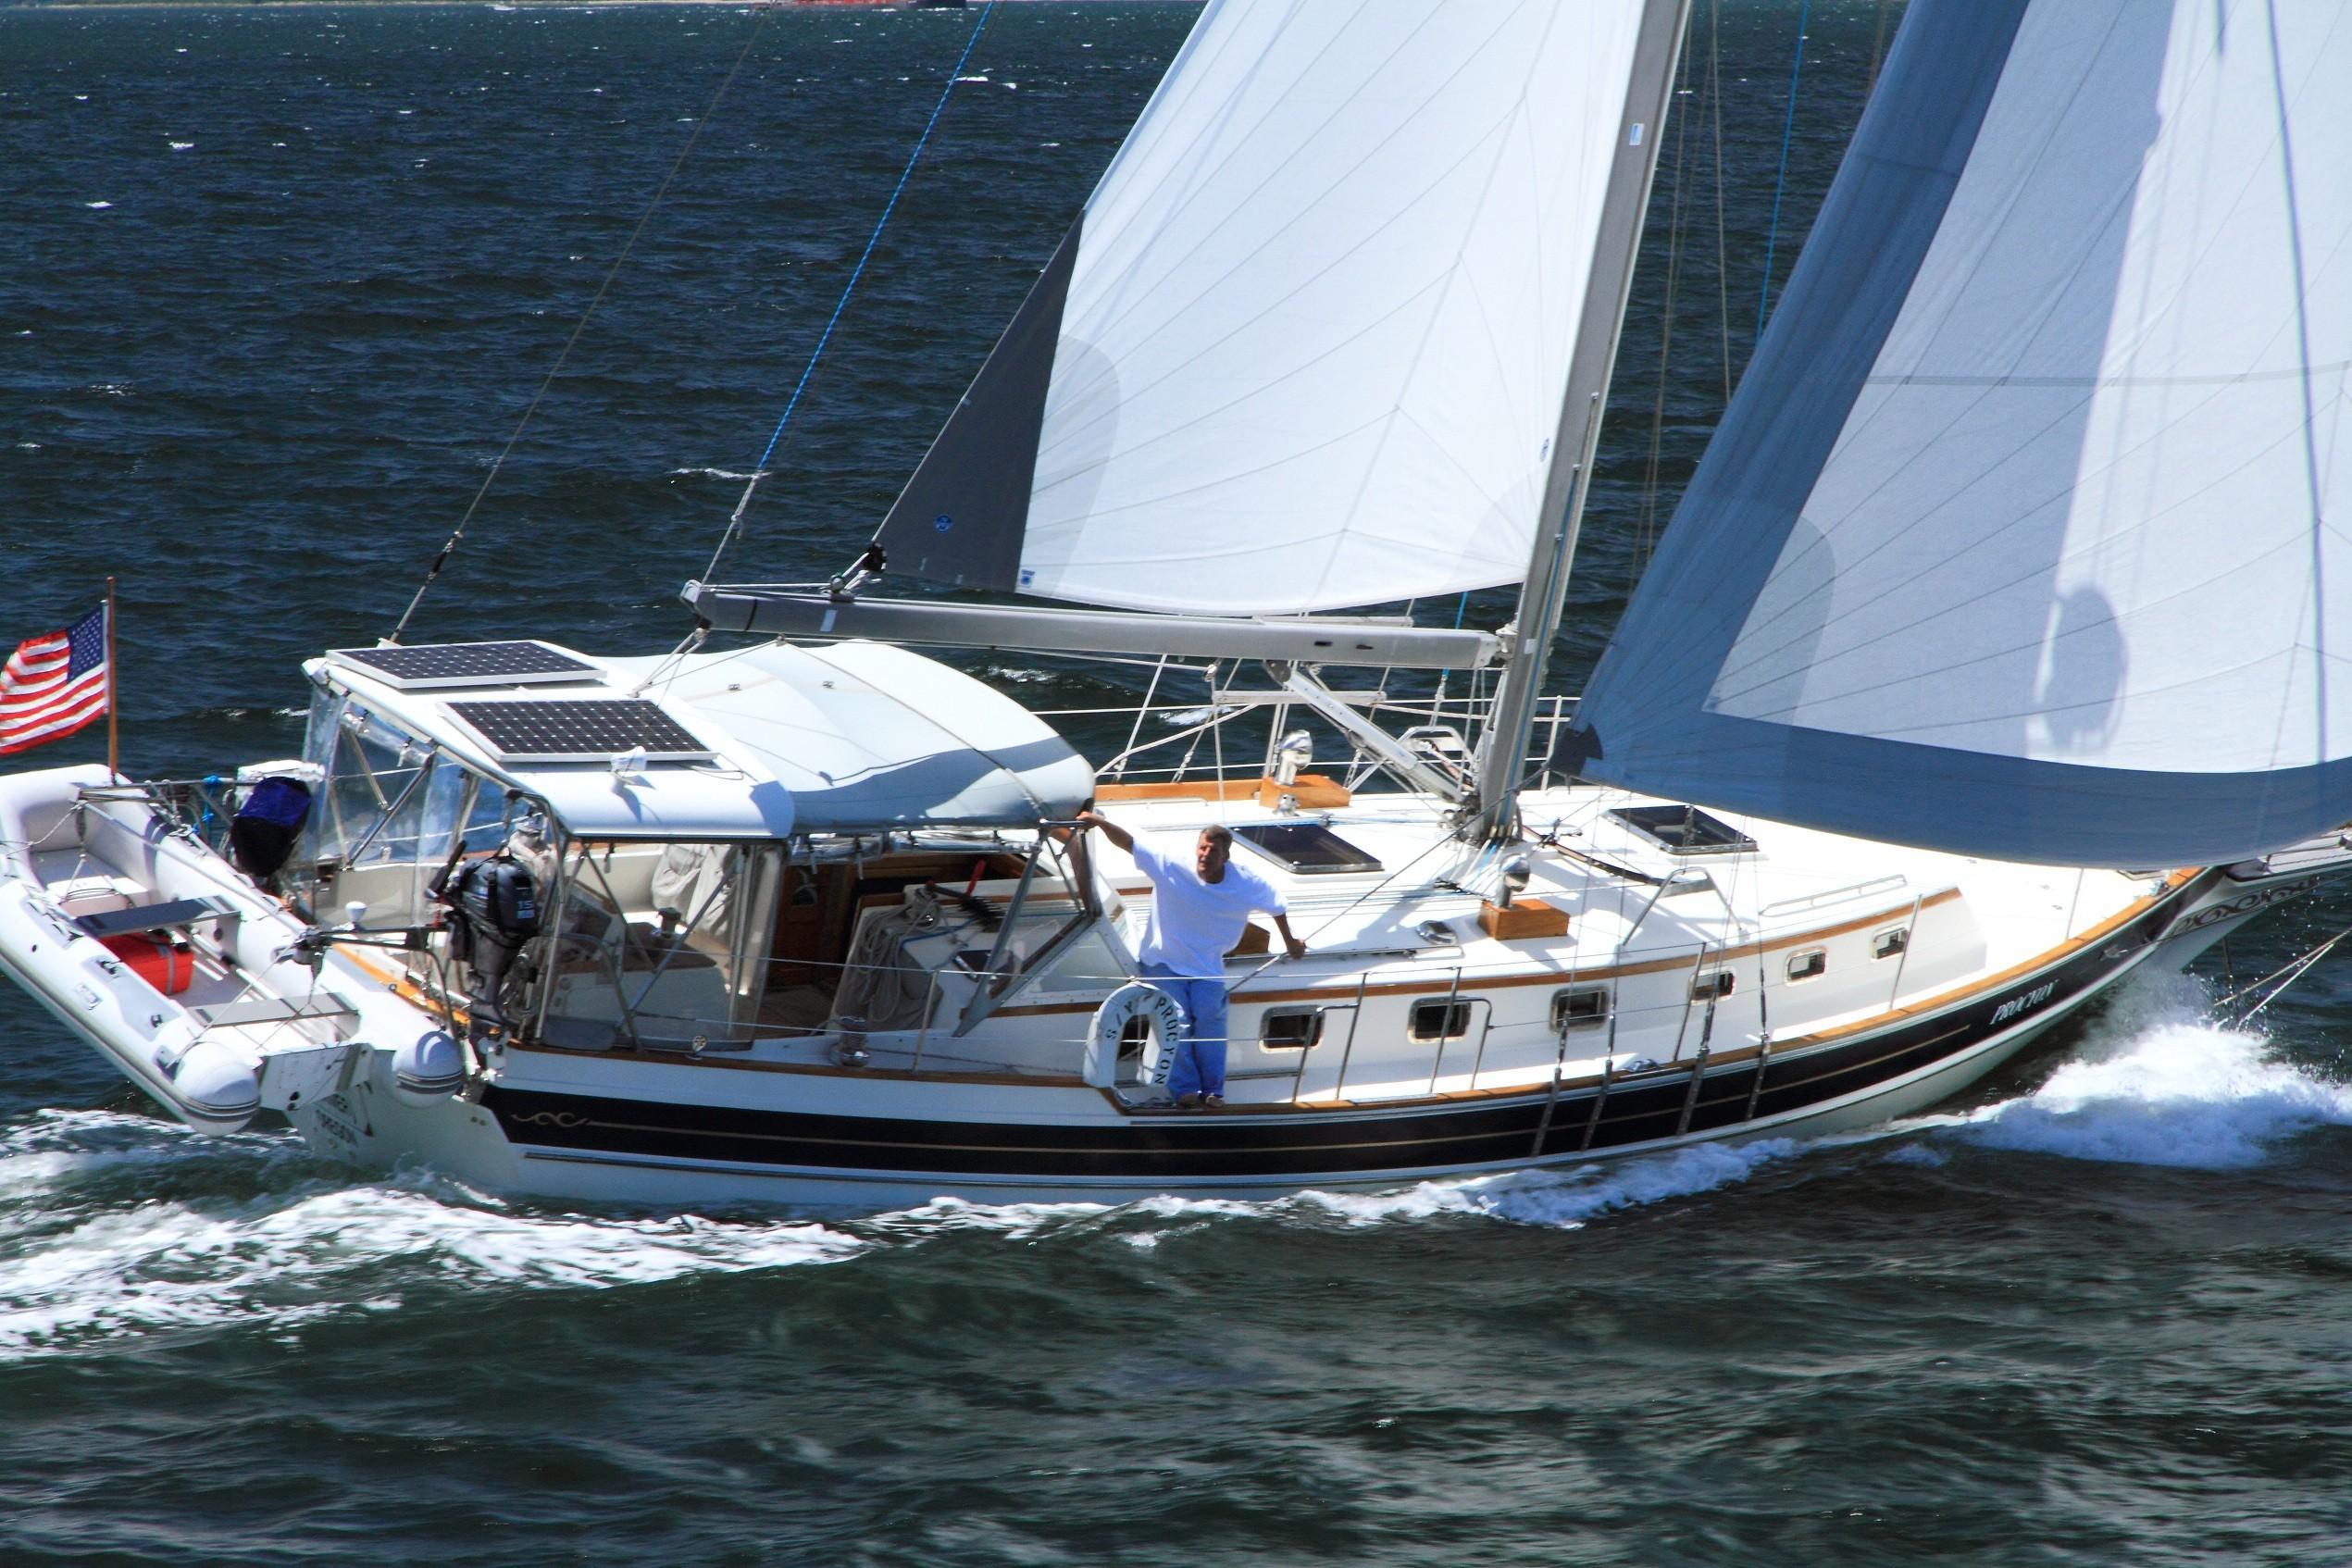 Schaefer Boom Vang 4:1 for Sailboats Up to 20-Feet